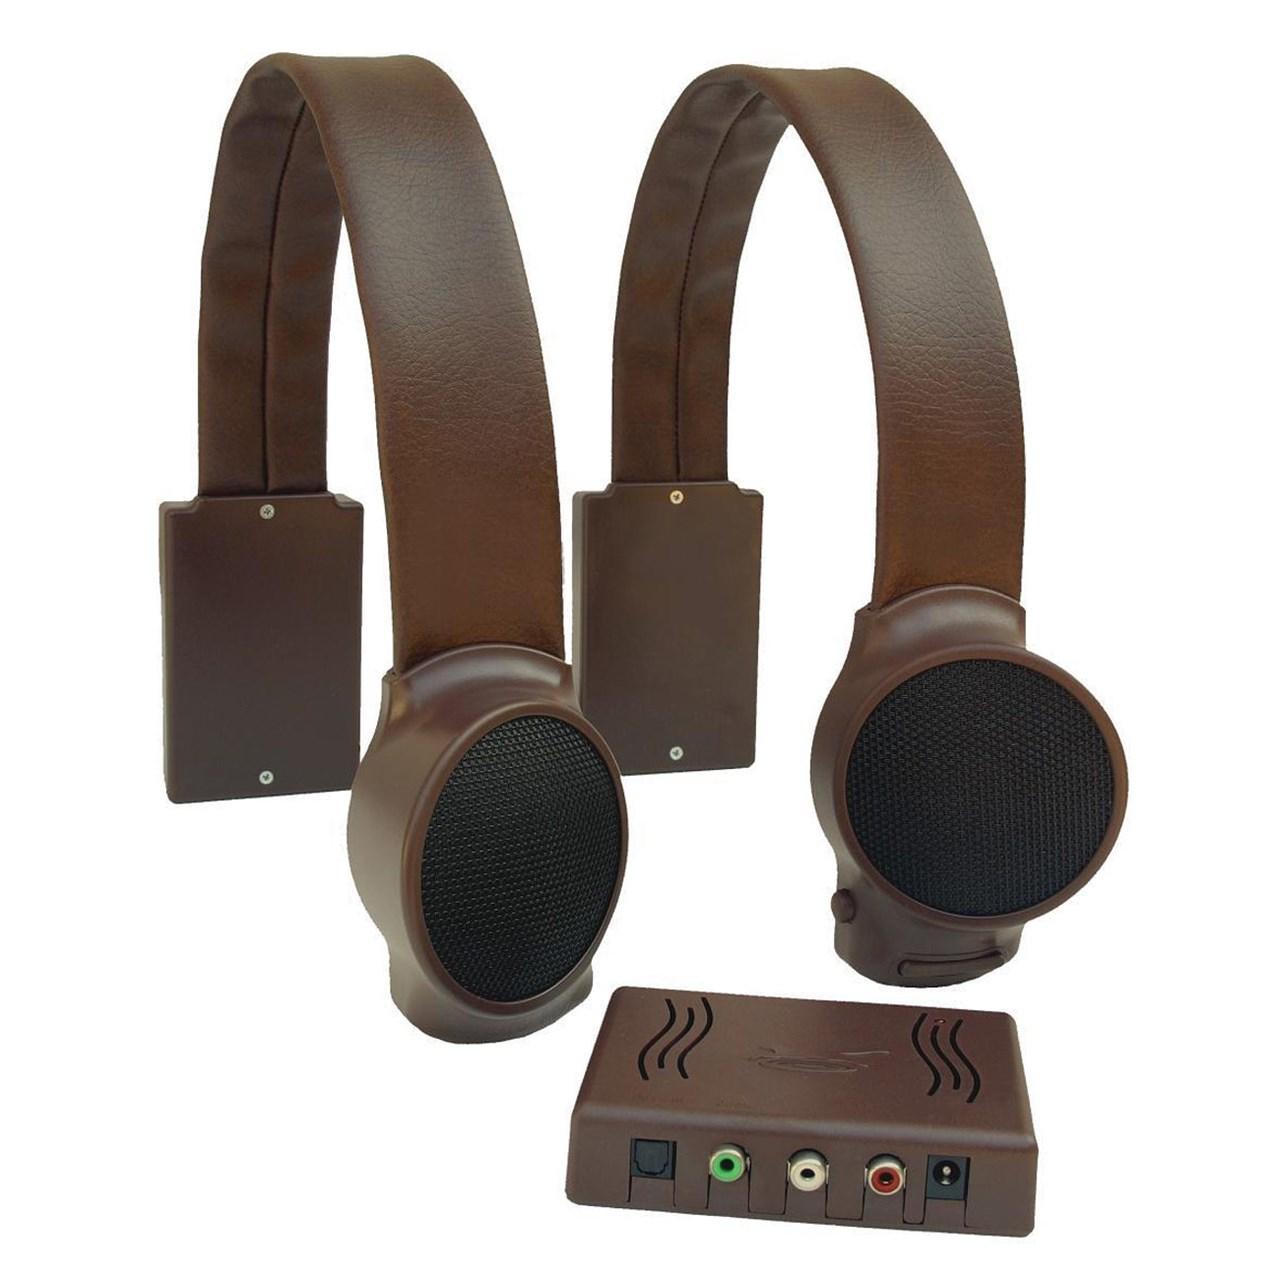 MaxiAids : Wireless TV Listening Speakers - Dark Brown